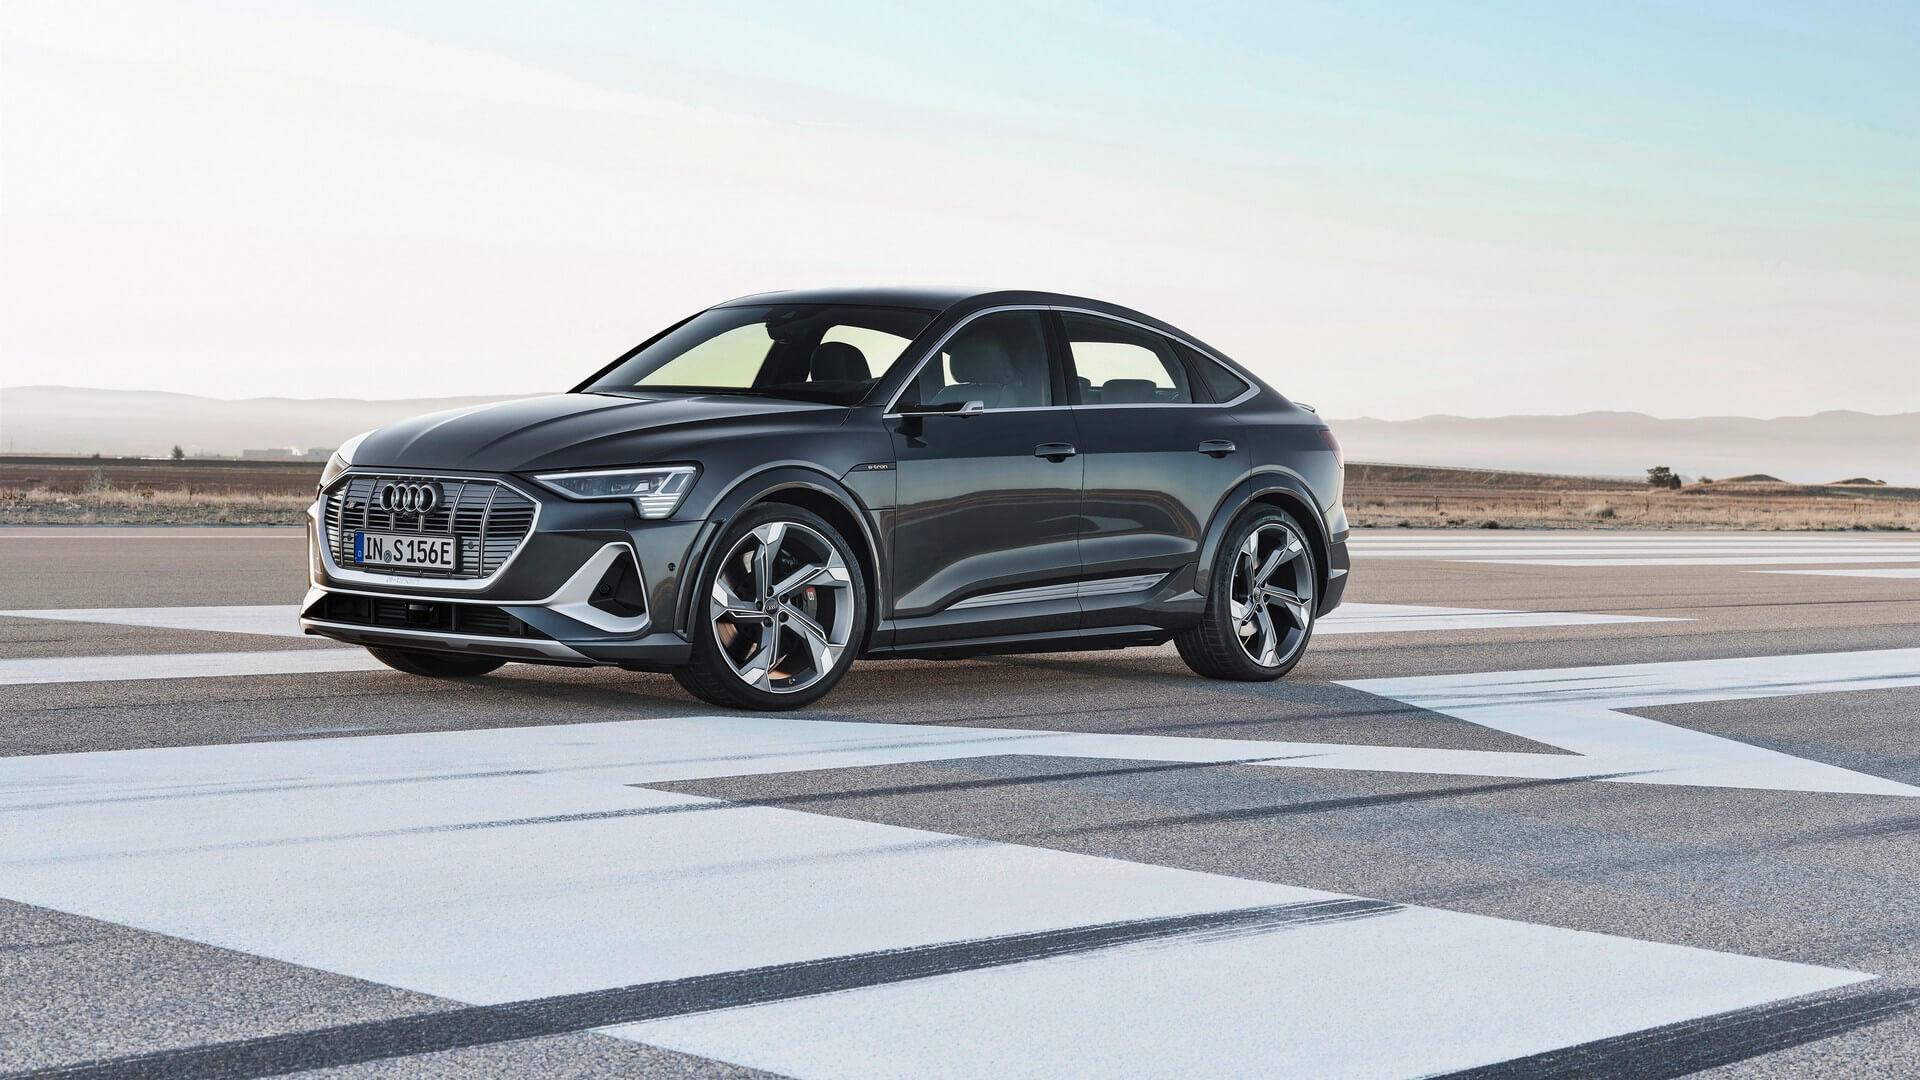 Audi-E-Tron-S-and-E-Tron-S-Sportback-2020-73